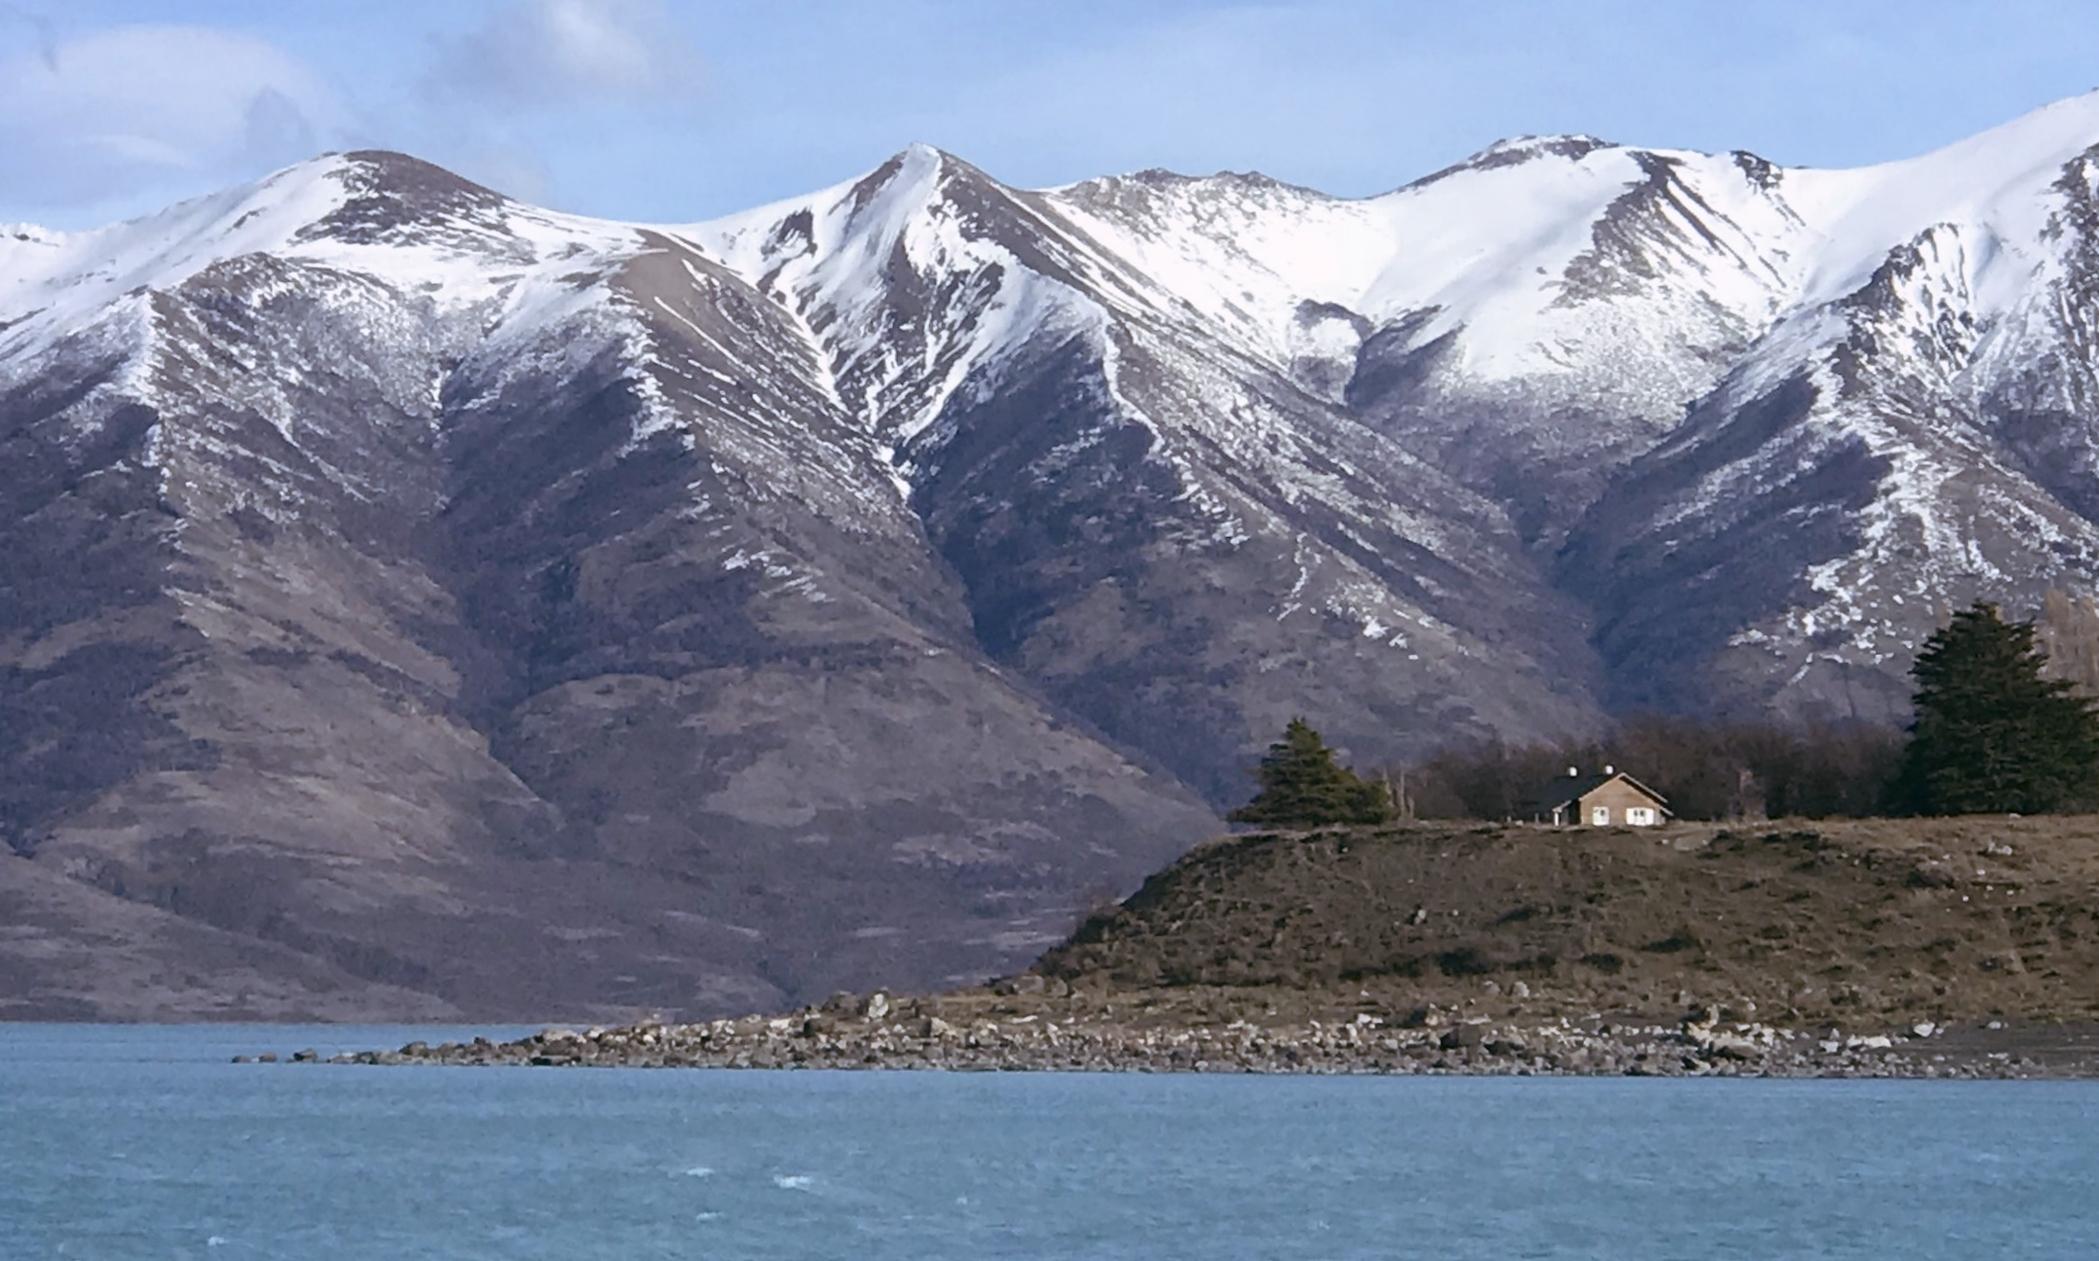 Photo captured on iPhone 7+ at El Calafate, Patagonia by Cara Ord